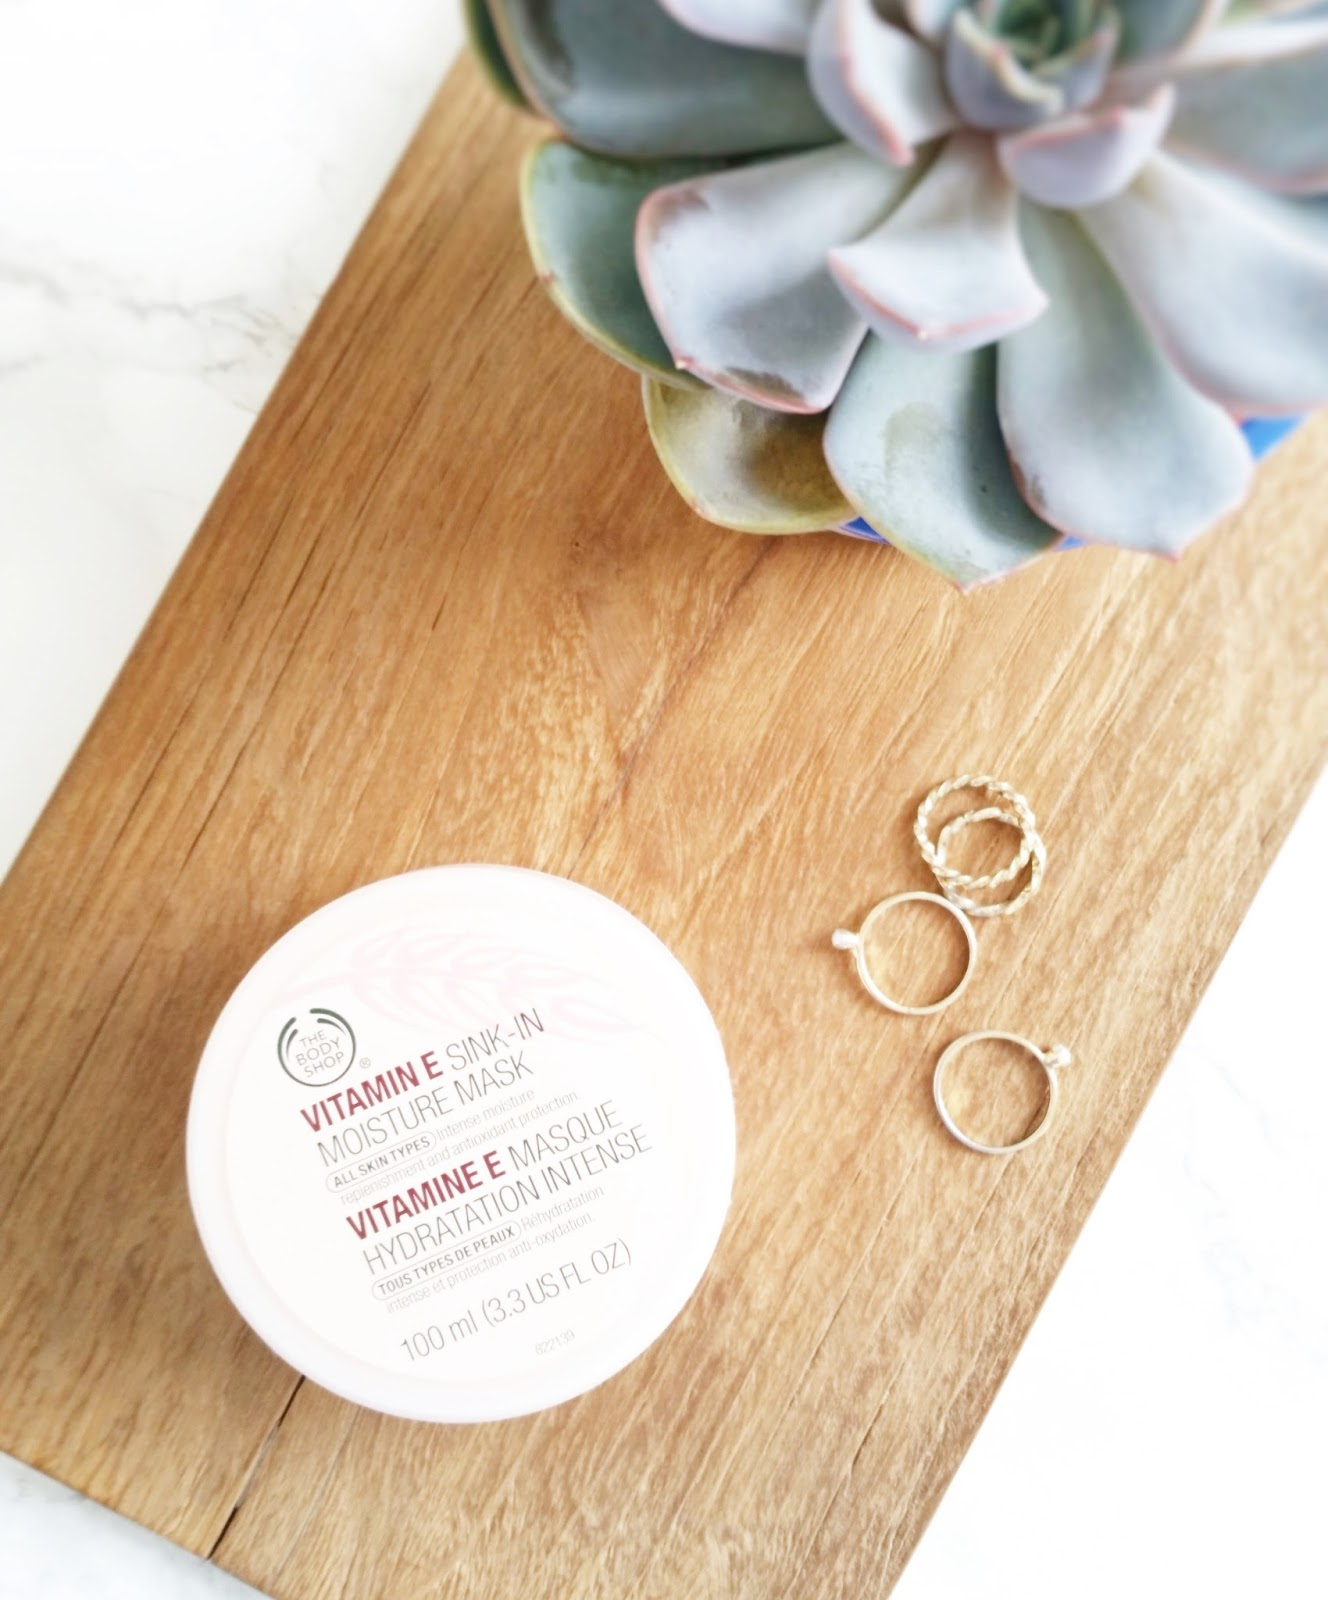 The Body Shop Vitamin E Sink-In Moisture Mask